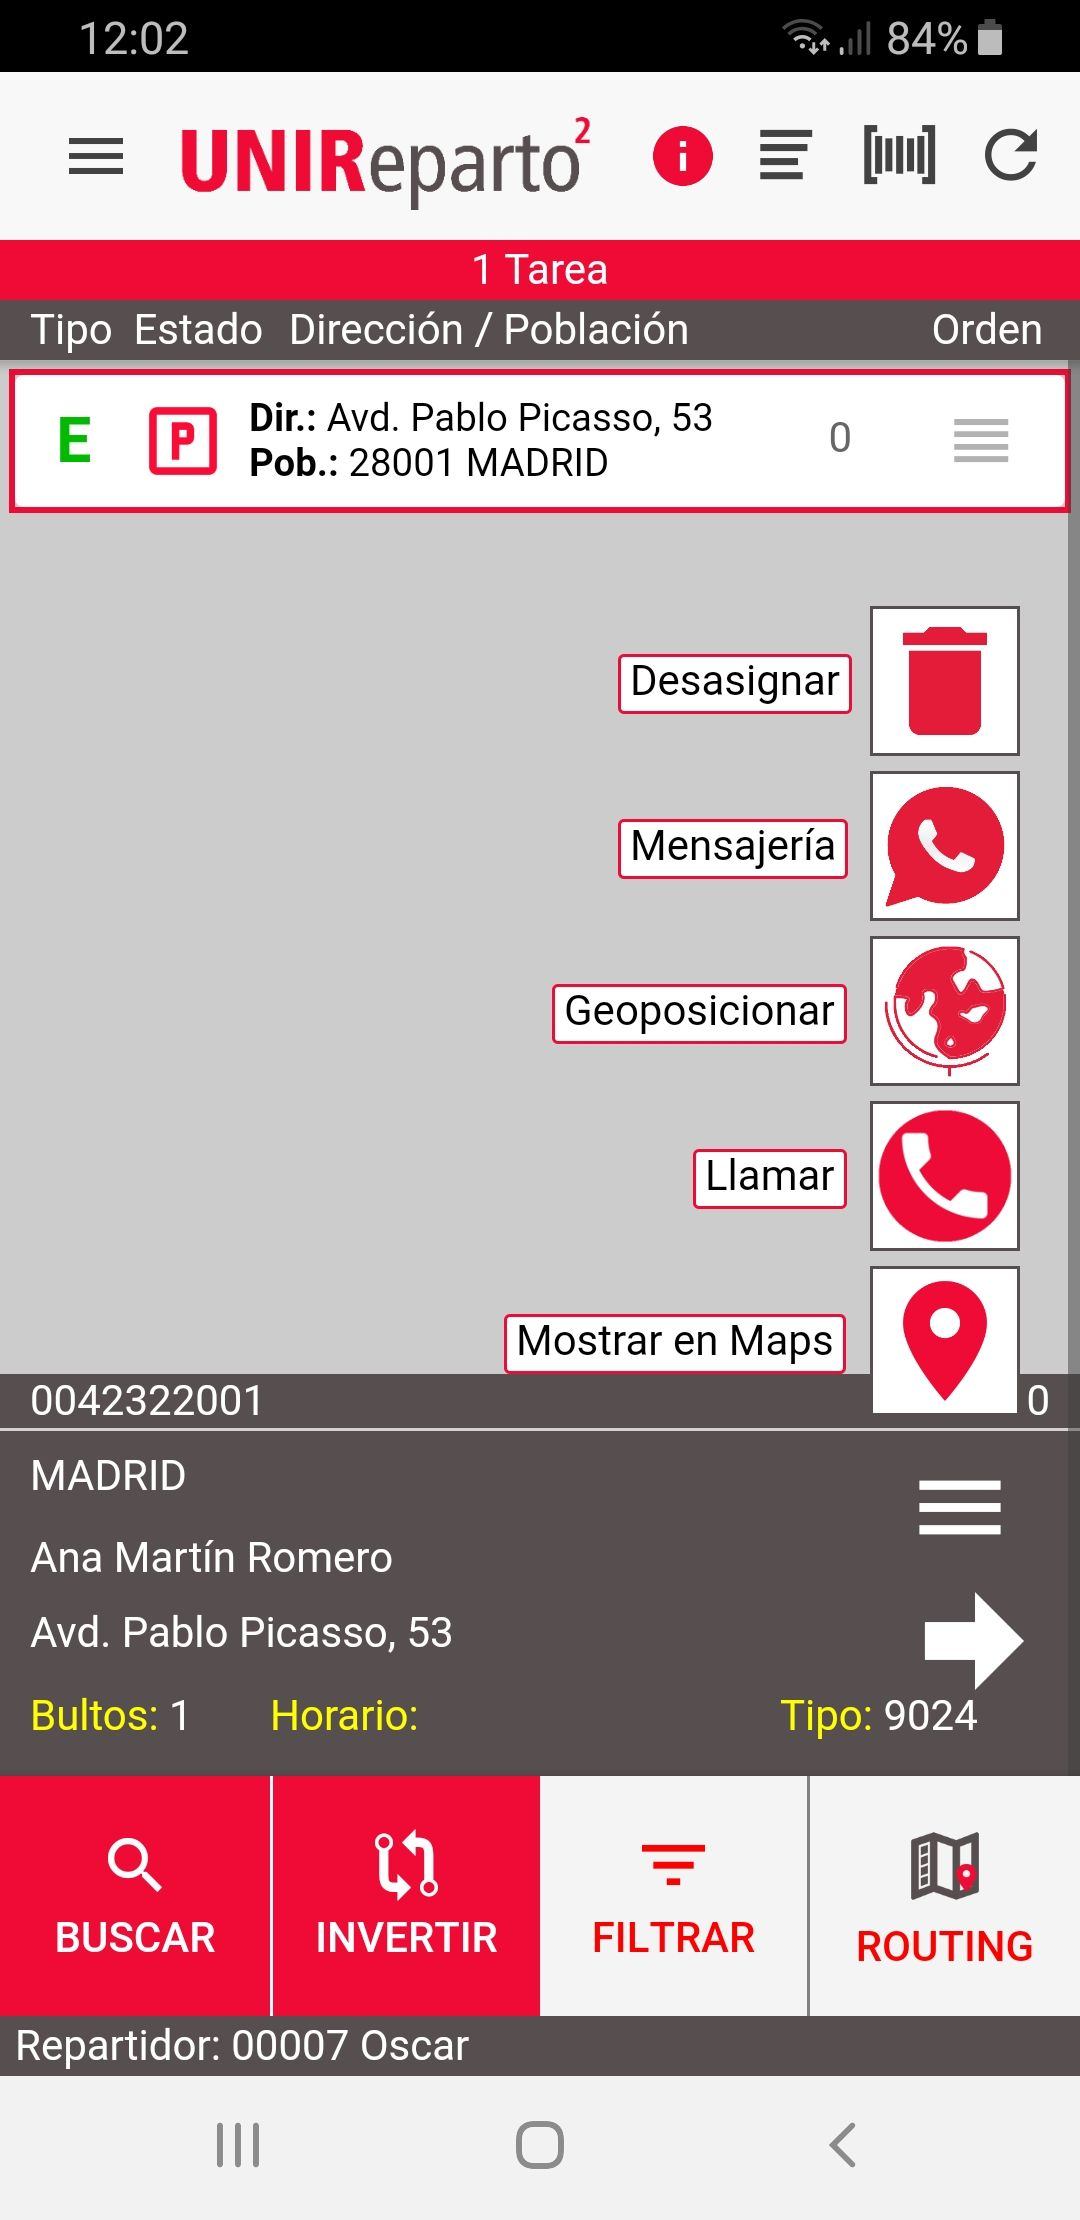 Unireparto_Gestiones_Tarea